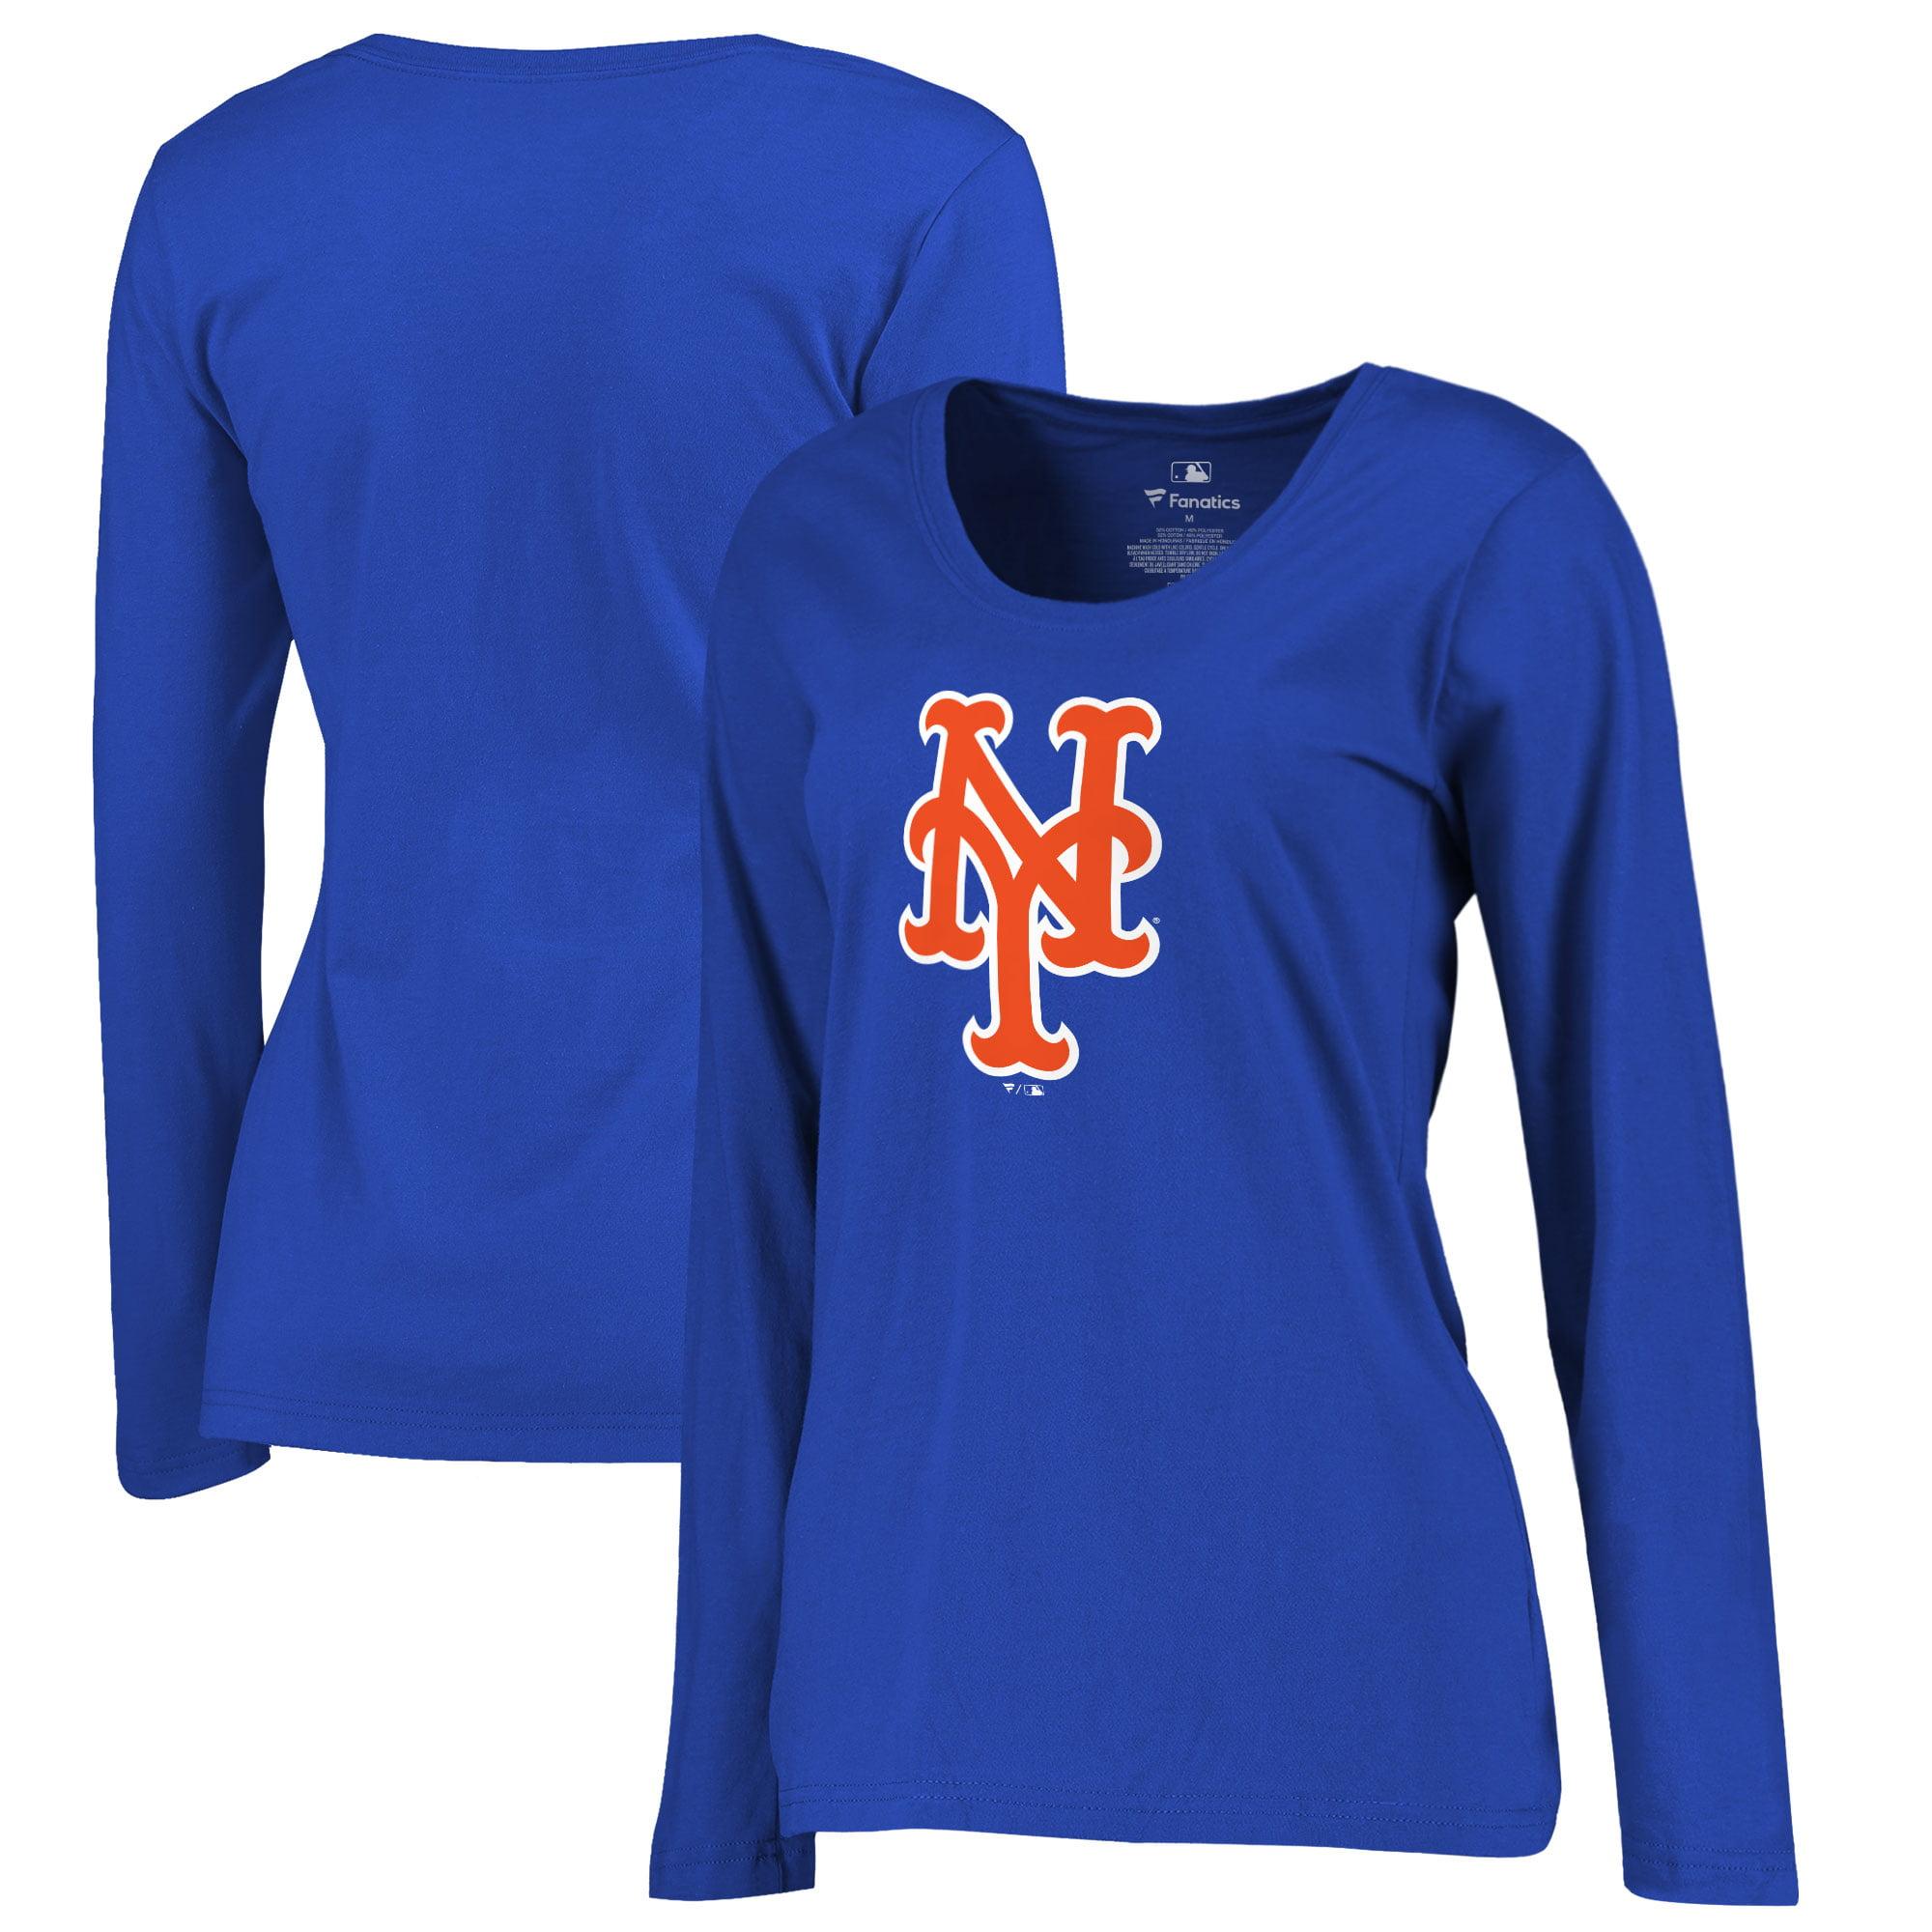 New York Mets Women's Plus Sizes Primary Team Logo Long Sleeve T-Shirt - Royal